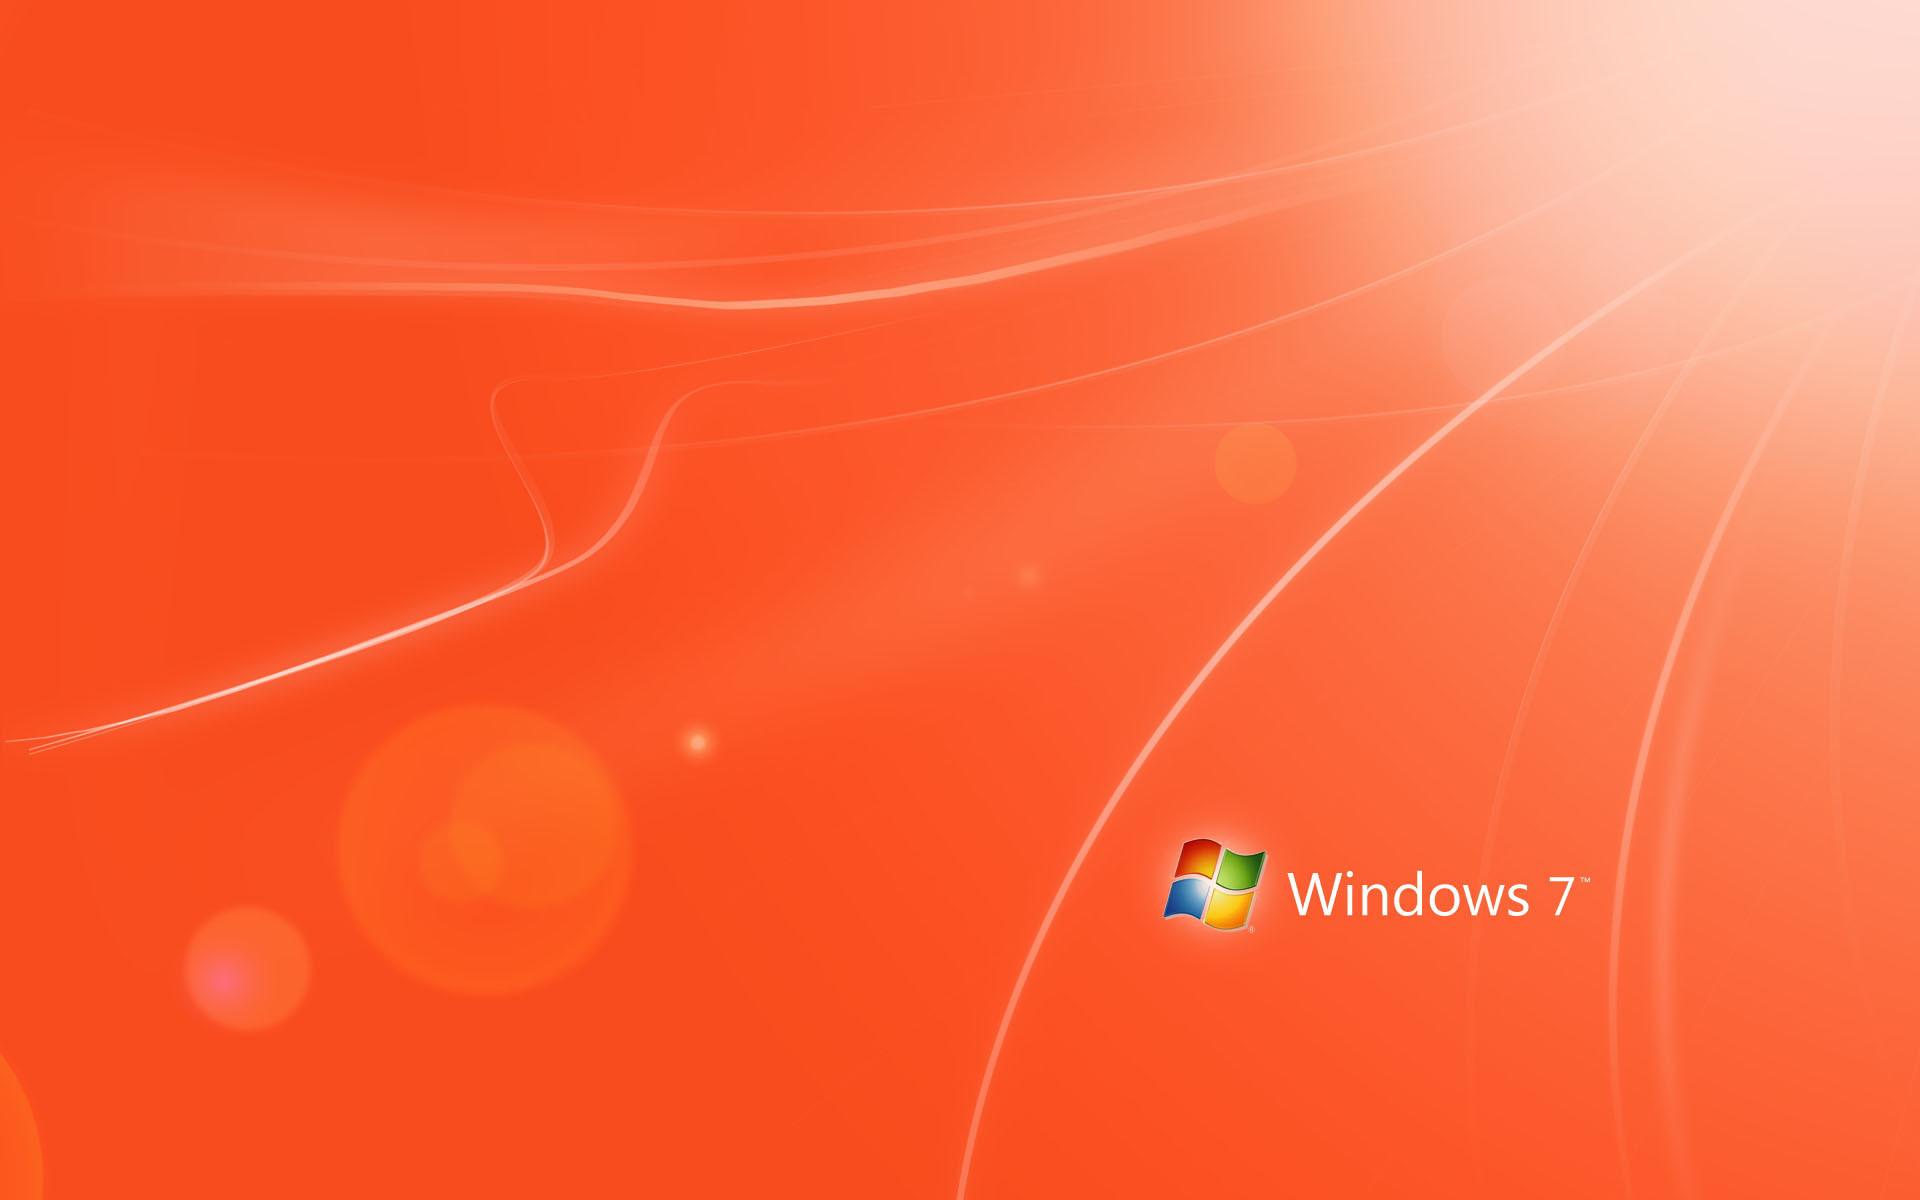 Full HD p Windows Wallpapers HD, Desktop Backgrounds 1280×800 Windows 7  Wallpapers Download (47 Wallpapers) | Adorable Wallpapers | Desktop |  Pinterest …